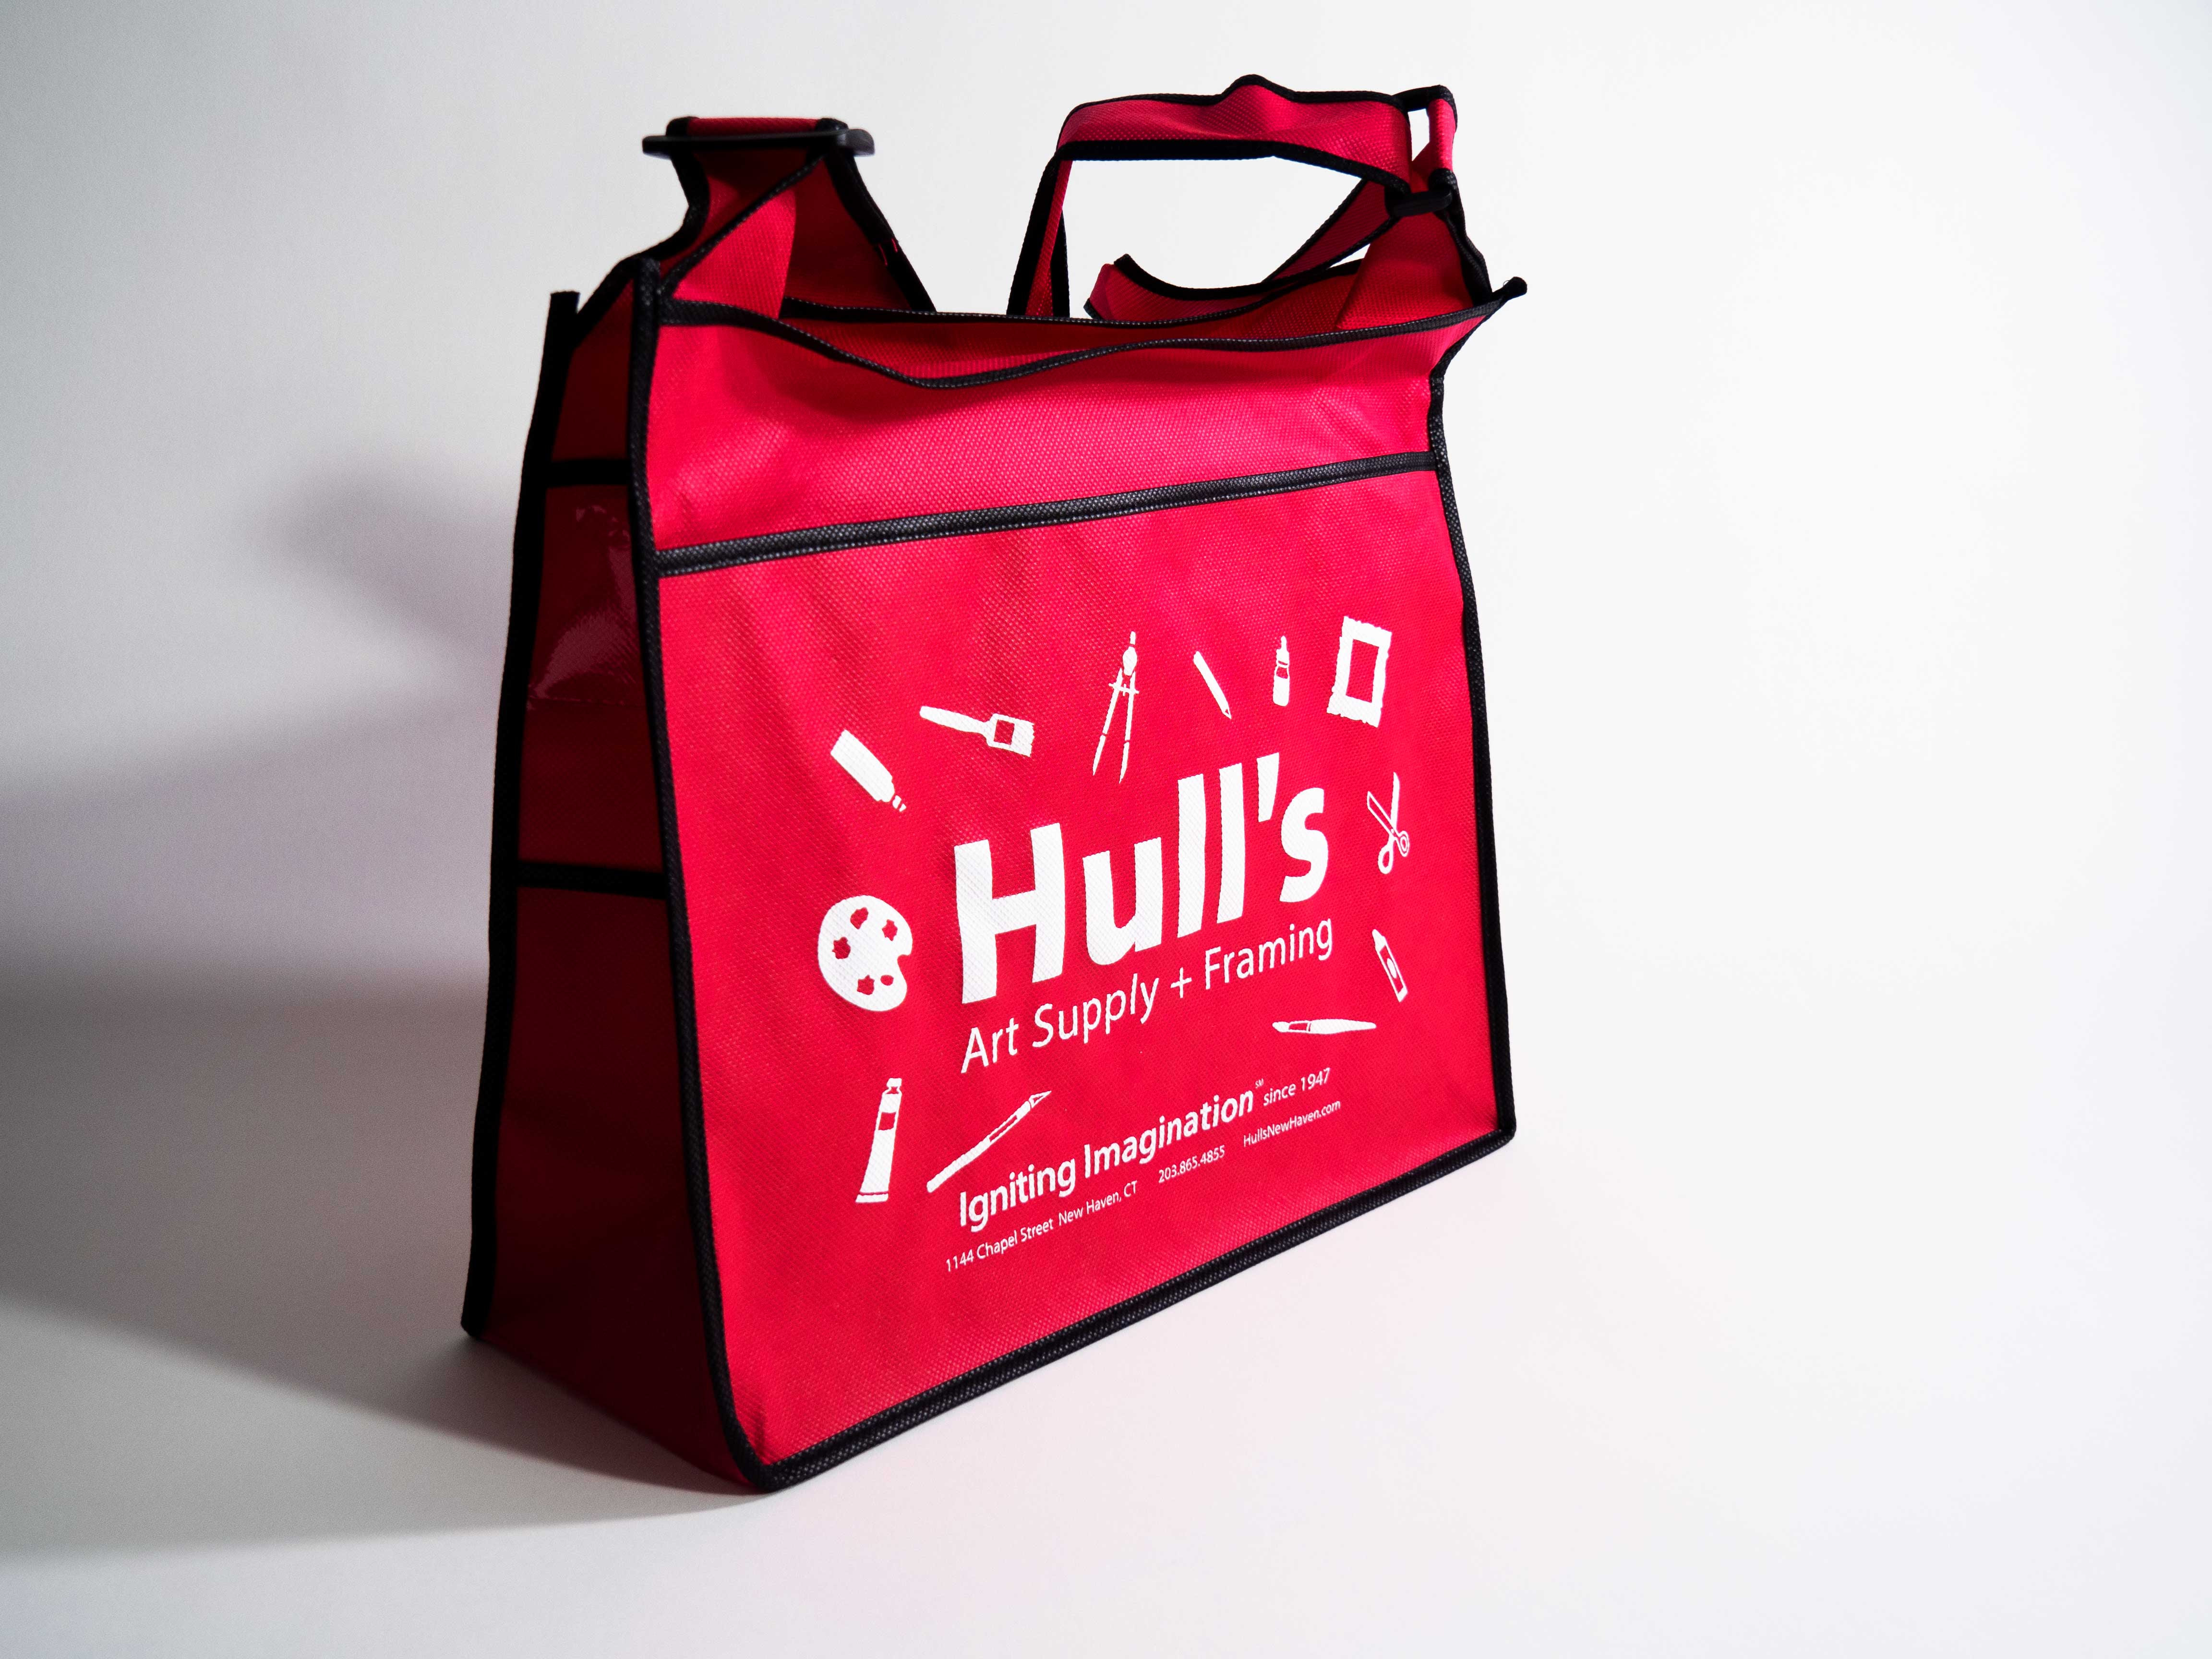 Hulls Art Supply Framing Group C Inc